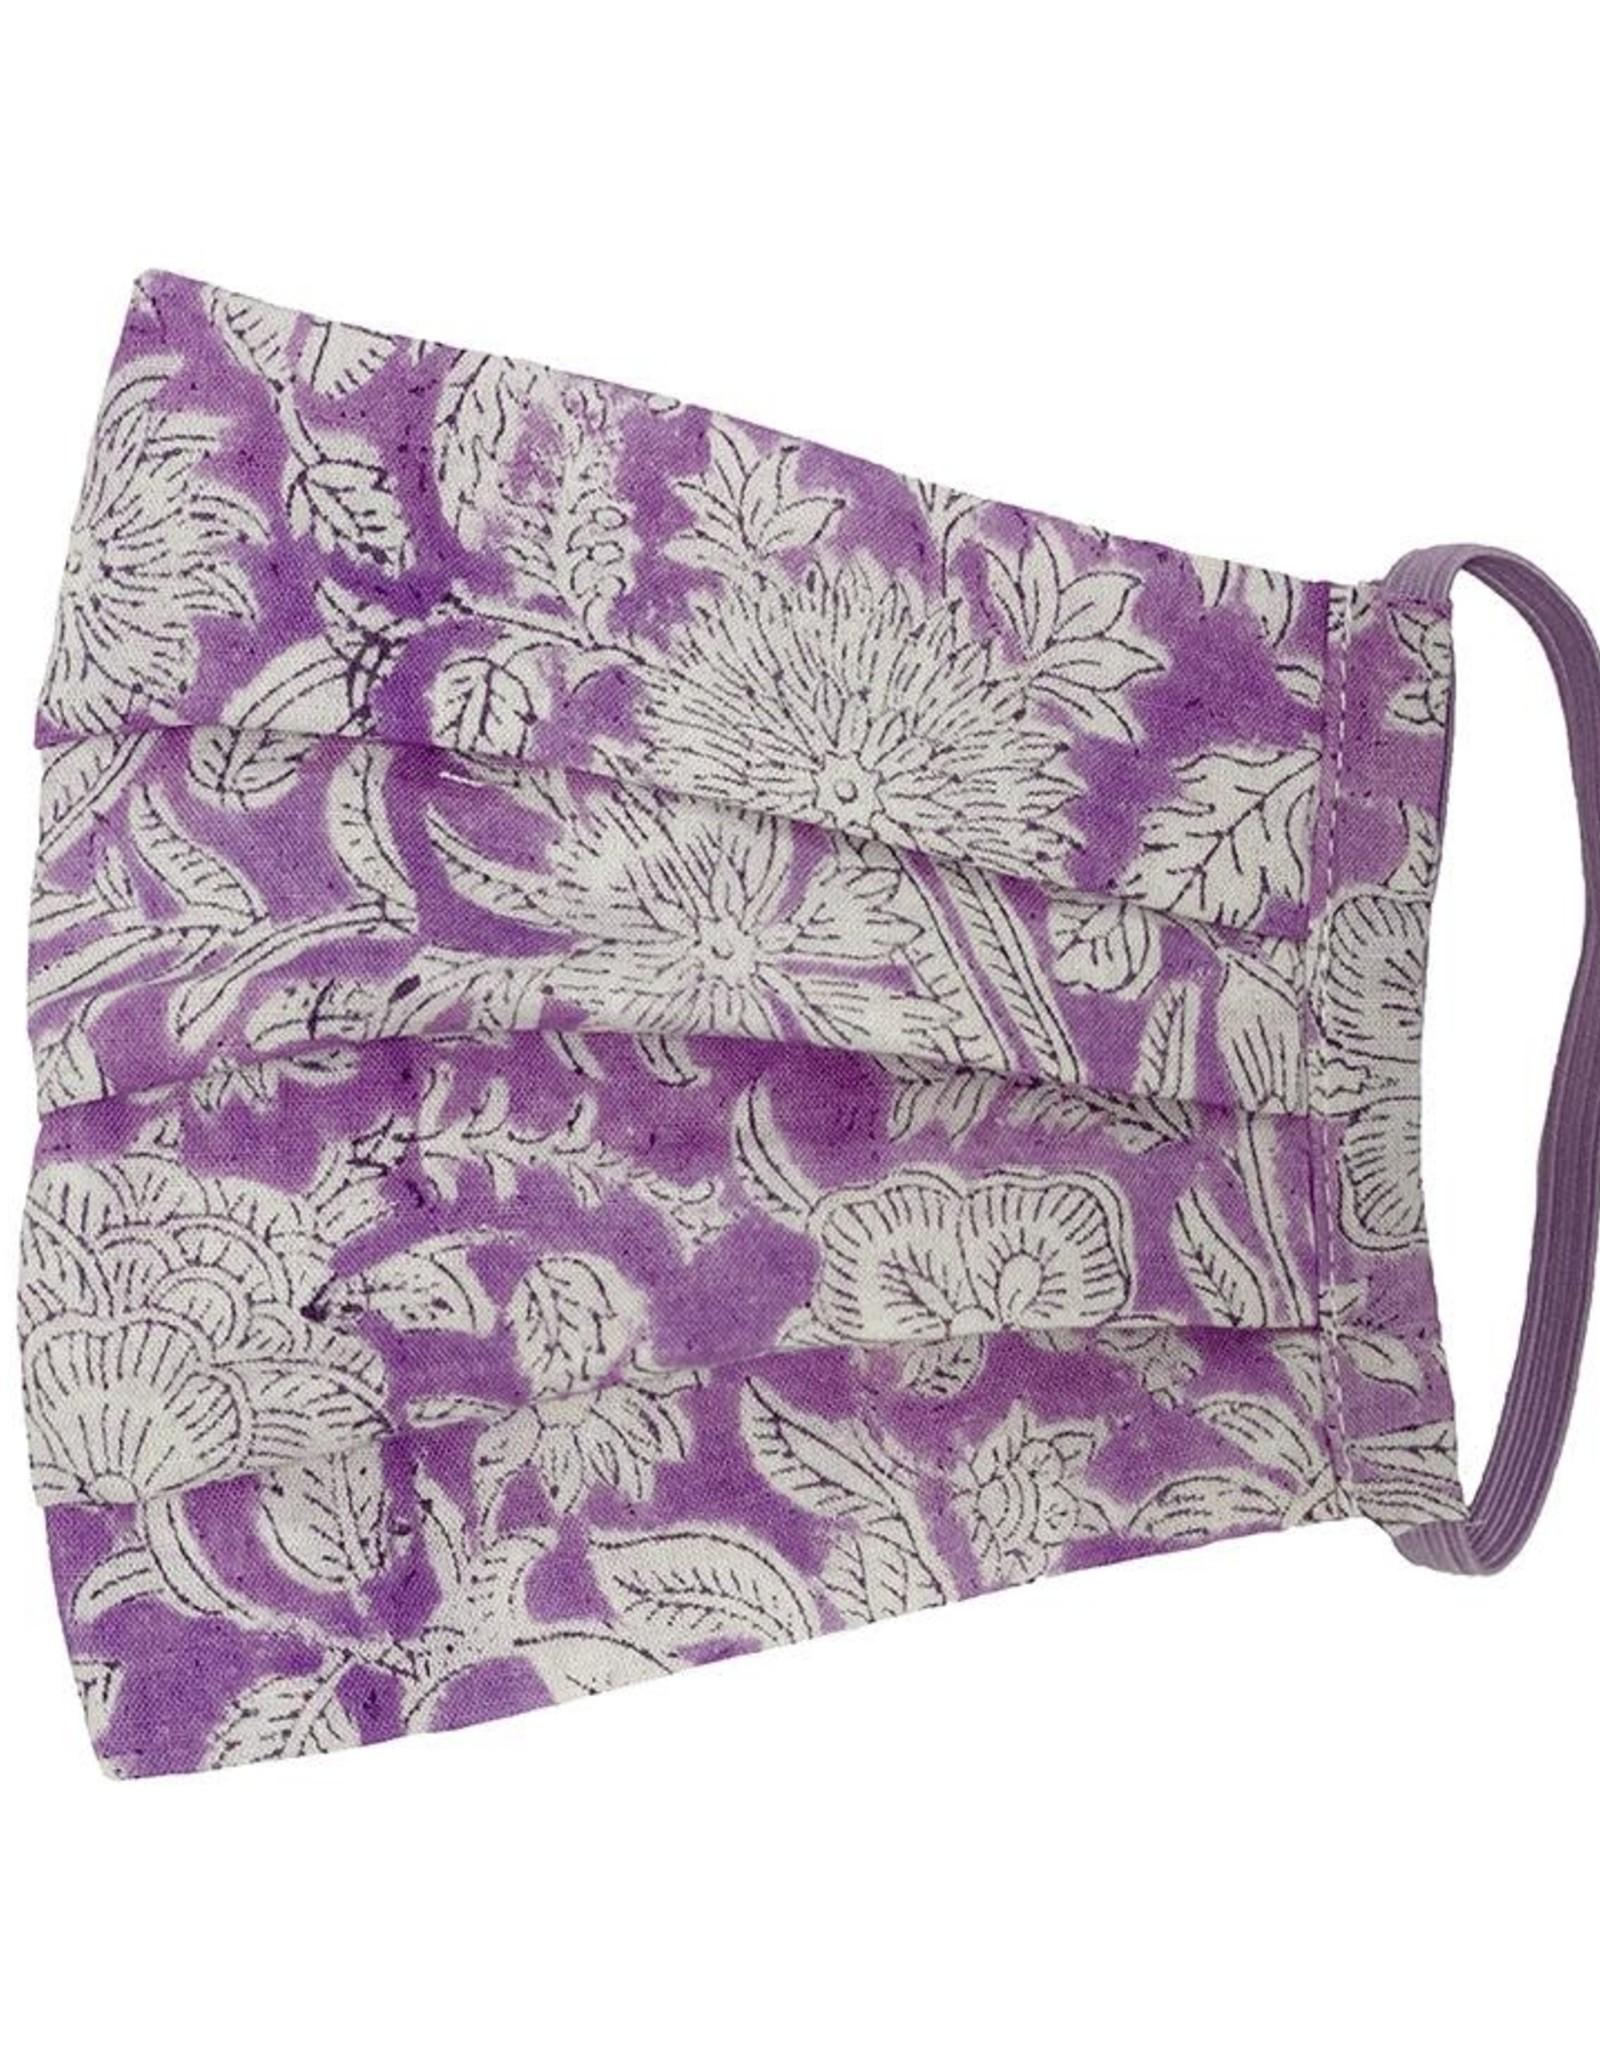 Everbloom Lavender Mask - Medium